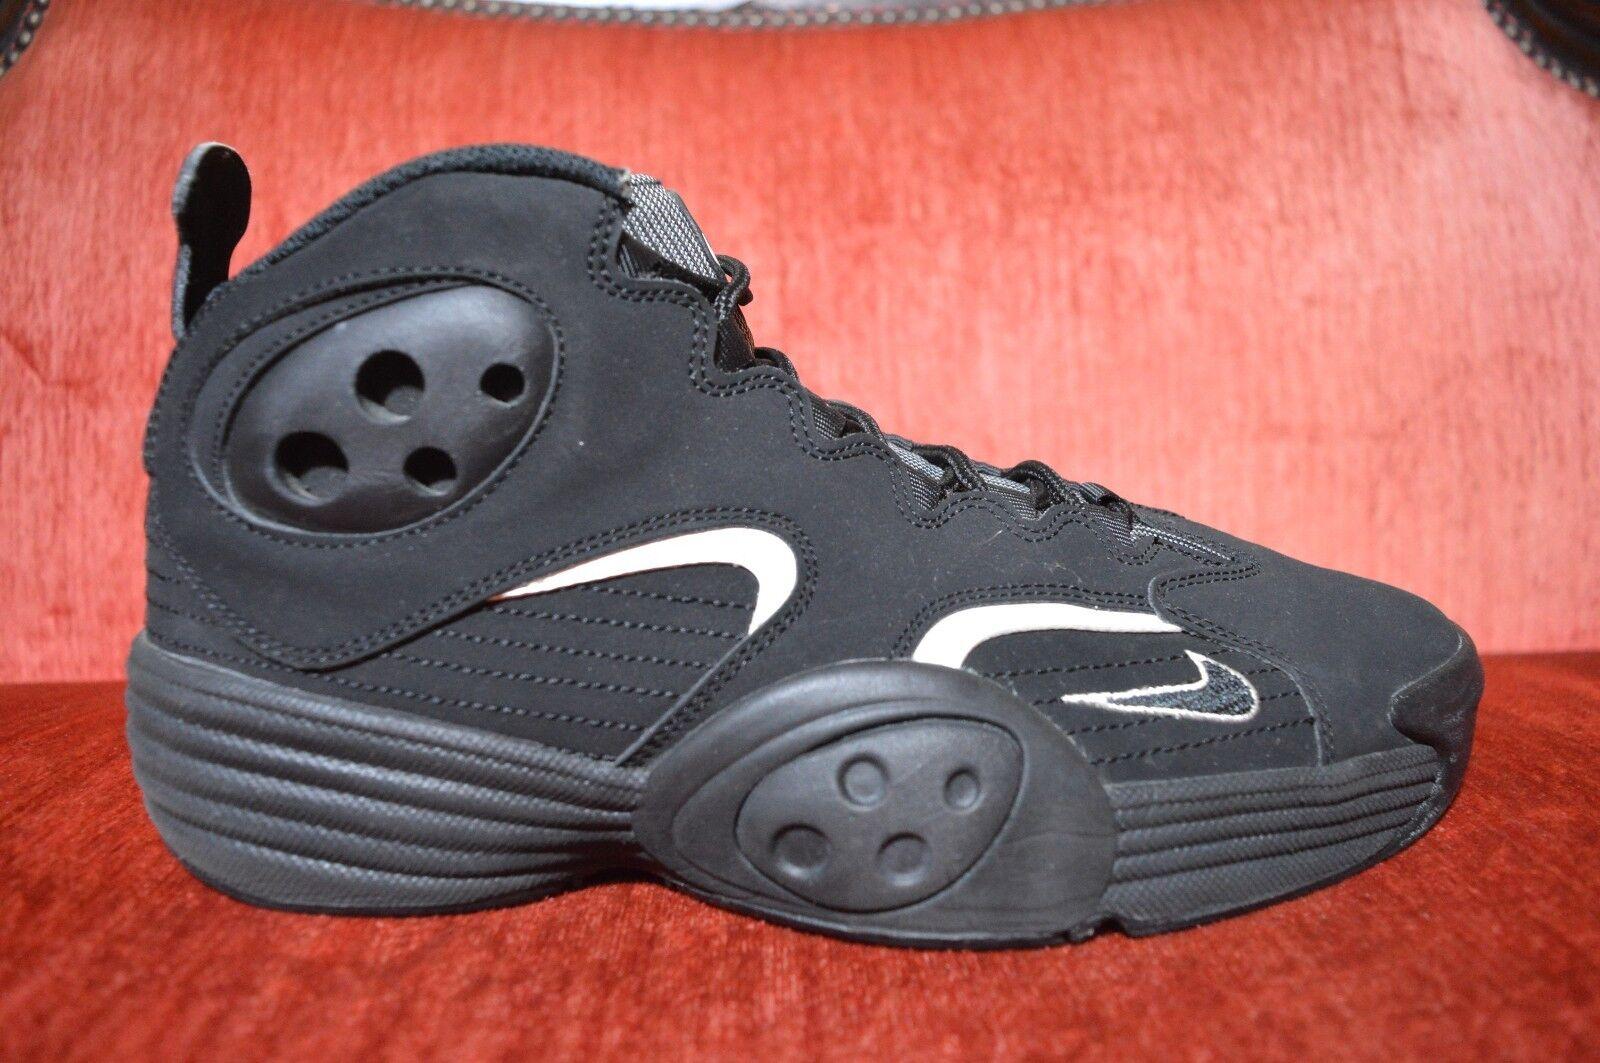 Nike Jordan 2012 Air Penny Flight 1 I One Black White Grey Size 10.5 538133 010